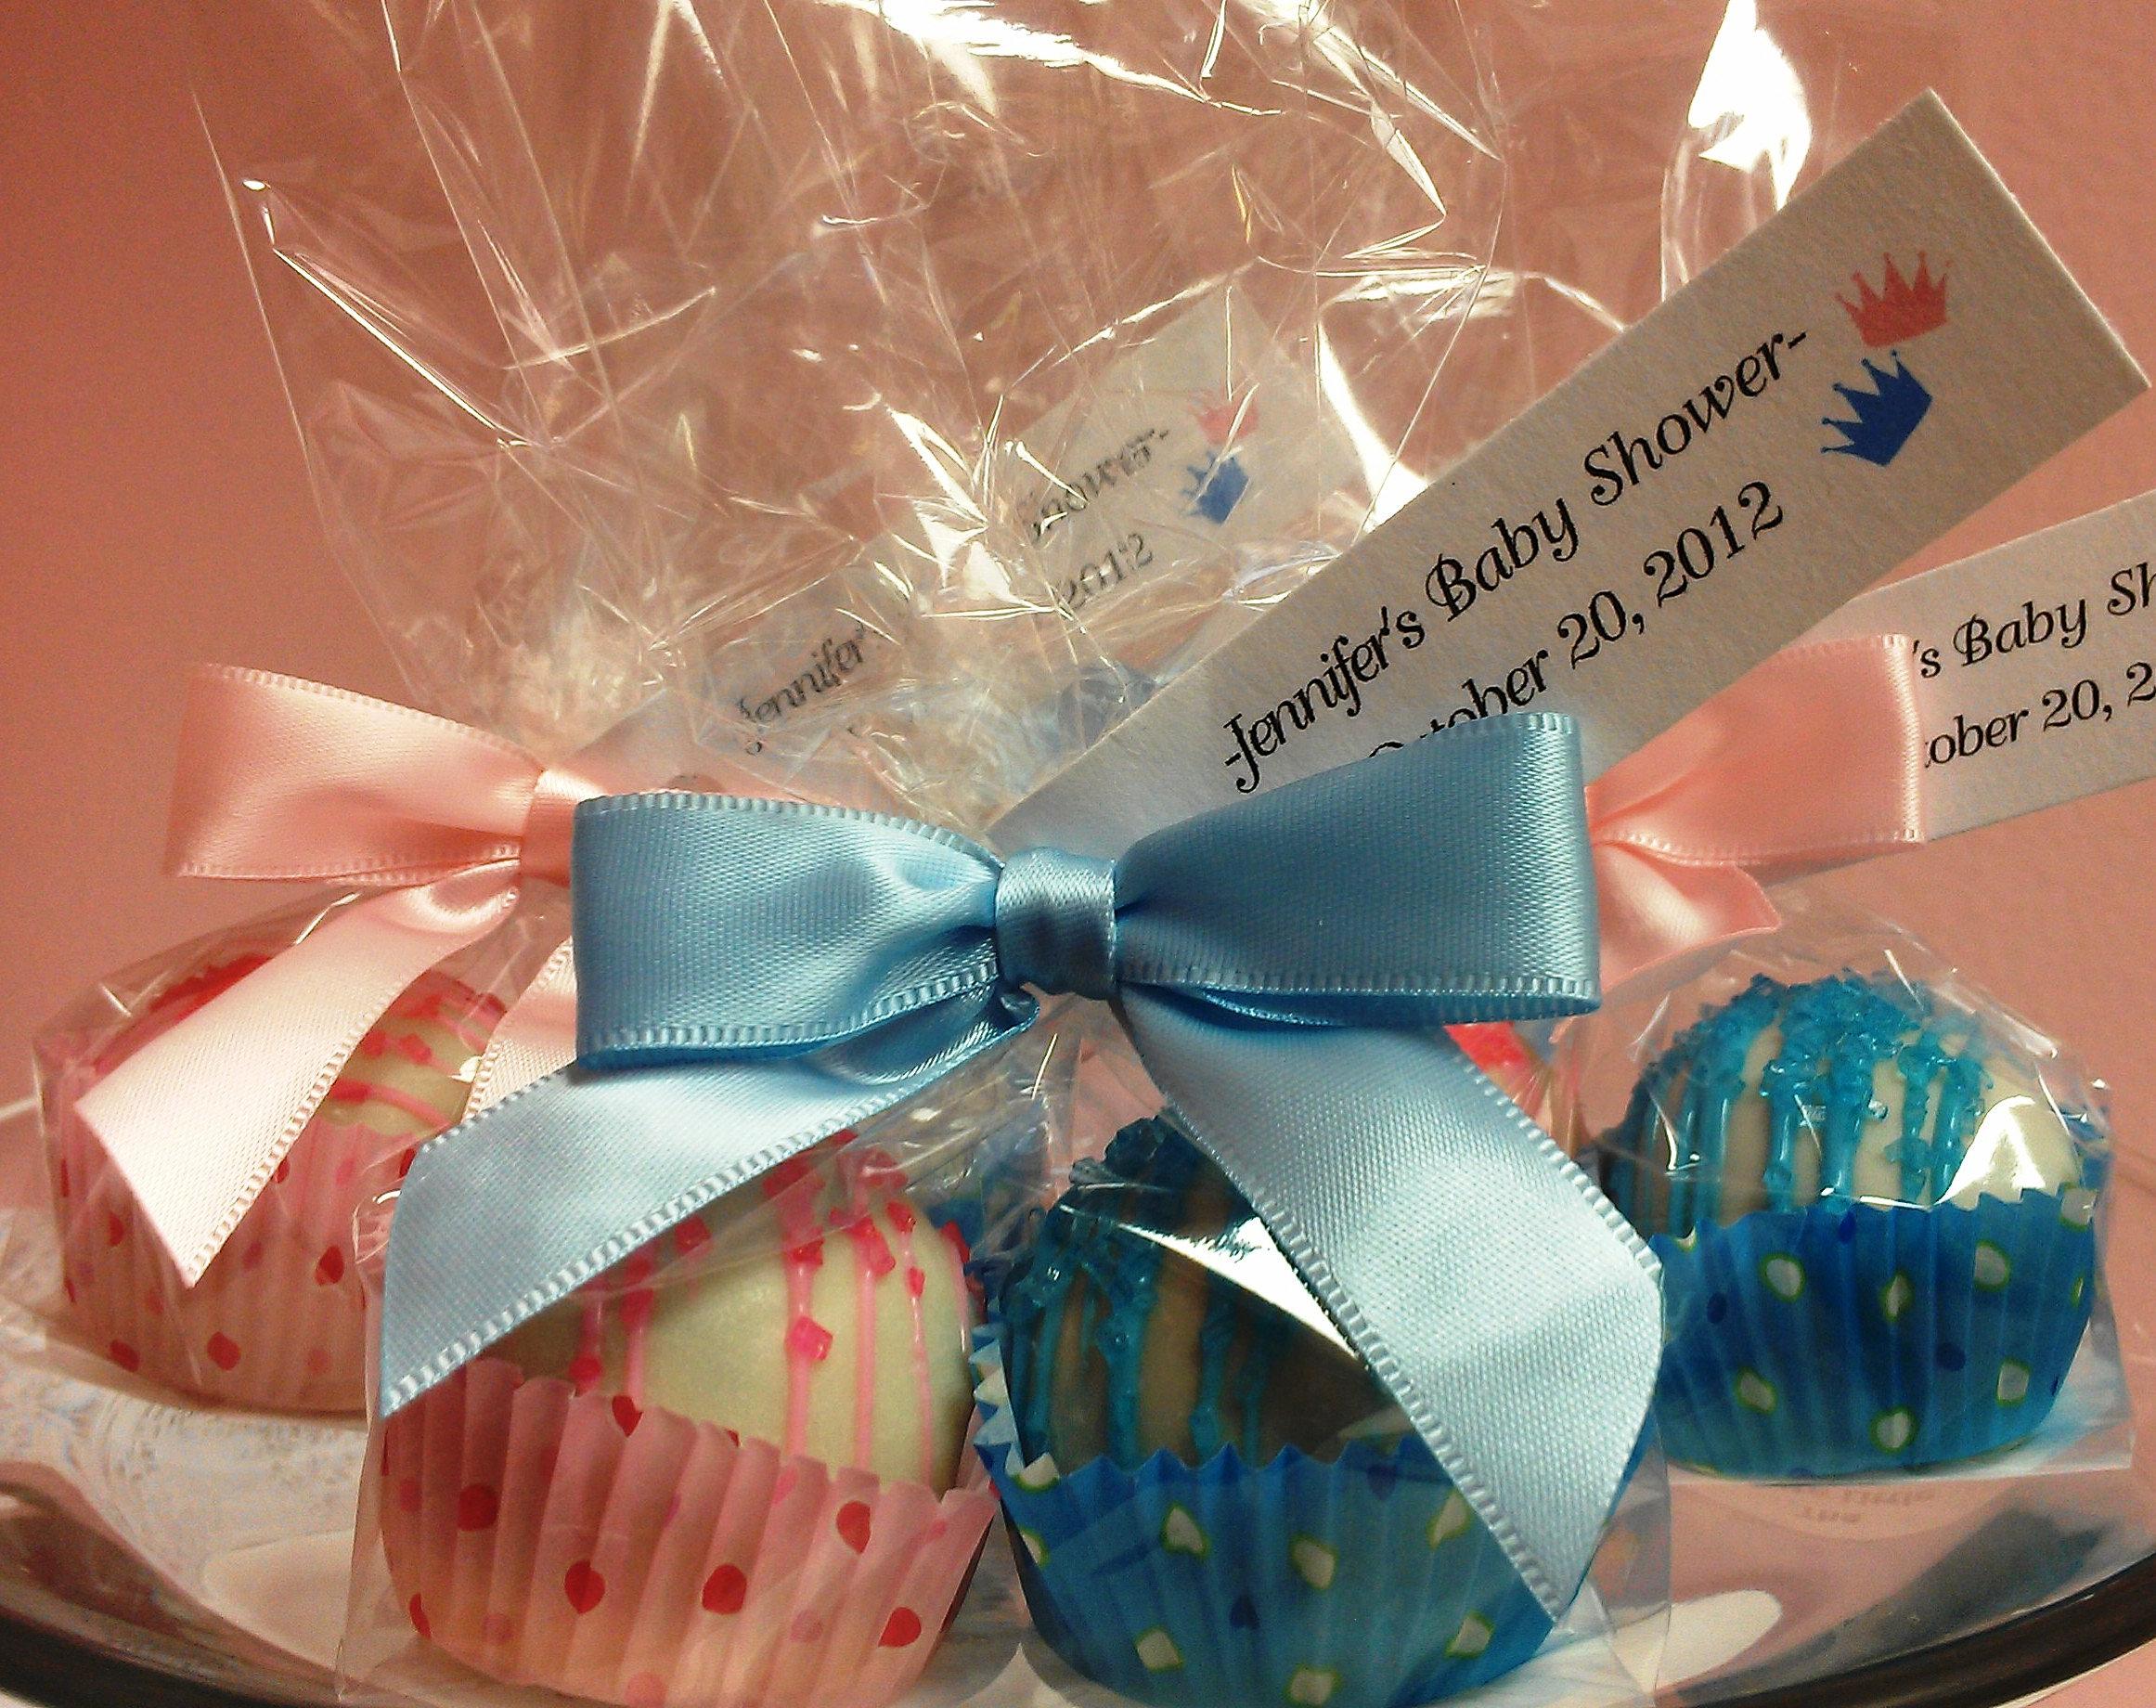 Cake Ball Ideas For Baby Shower : The Cute Little Cake Shop-Gourmet Cake Balls, Cake Pops ...